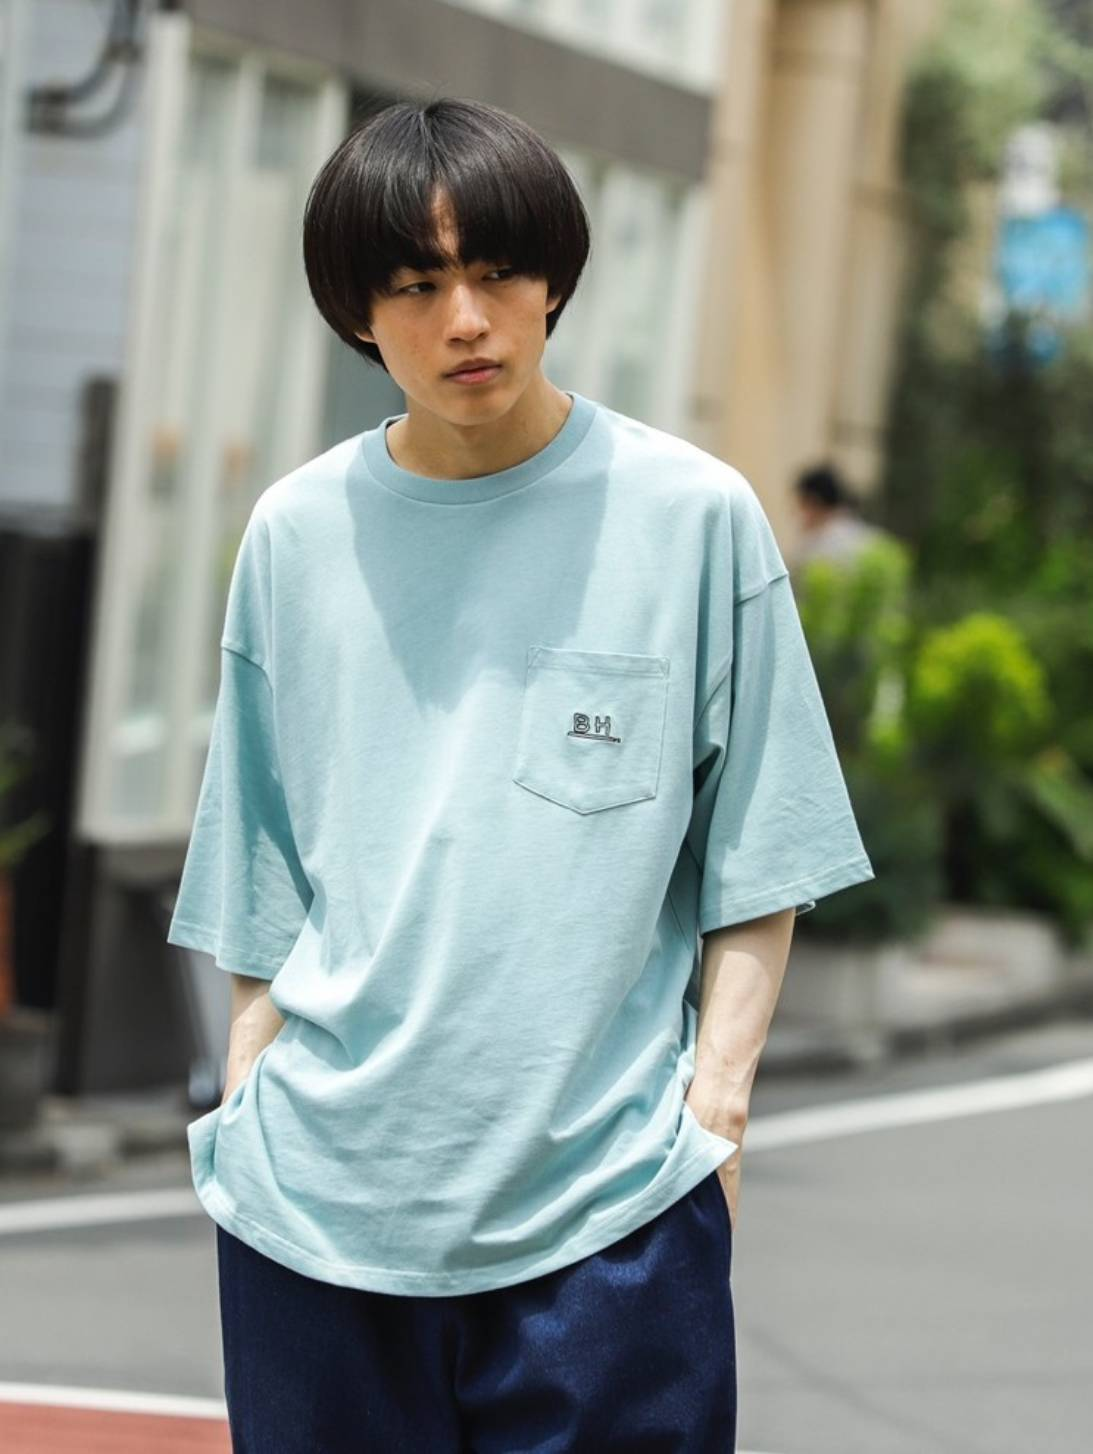 伊藤 千浩<span>/ B-TOKYO</span>